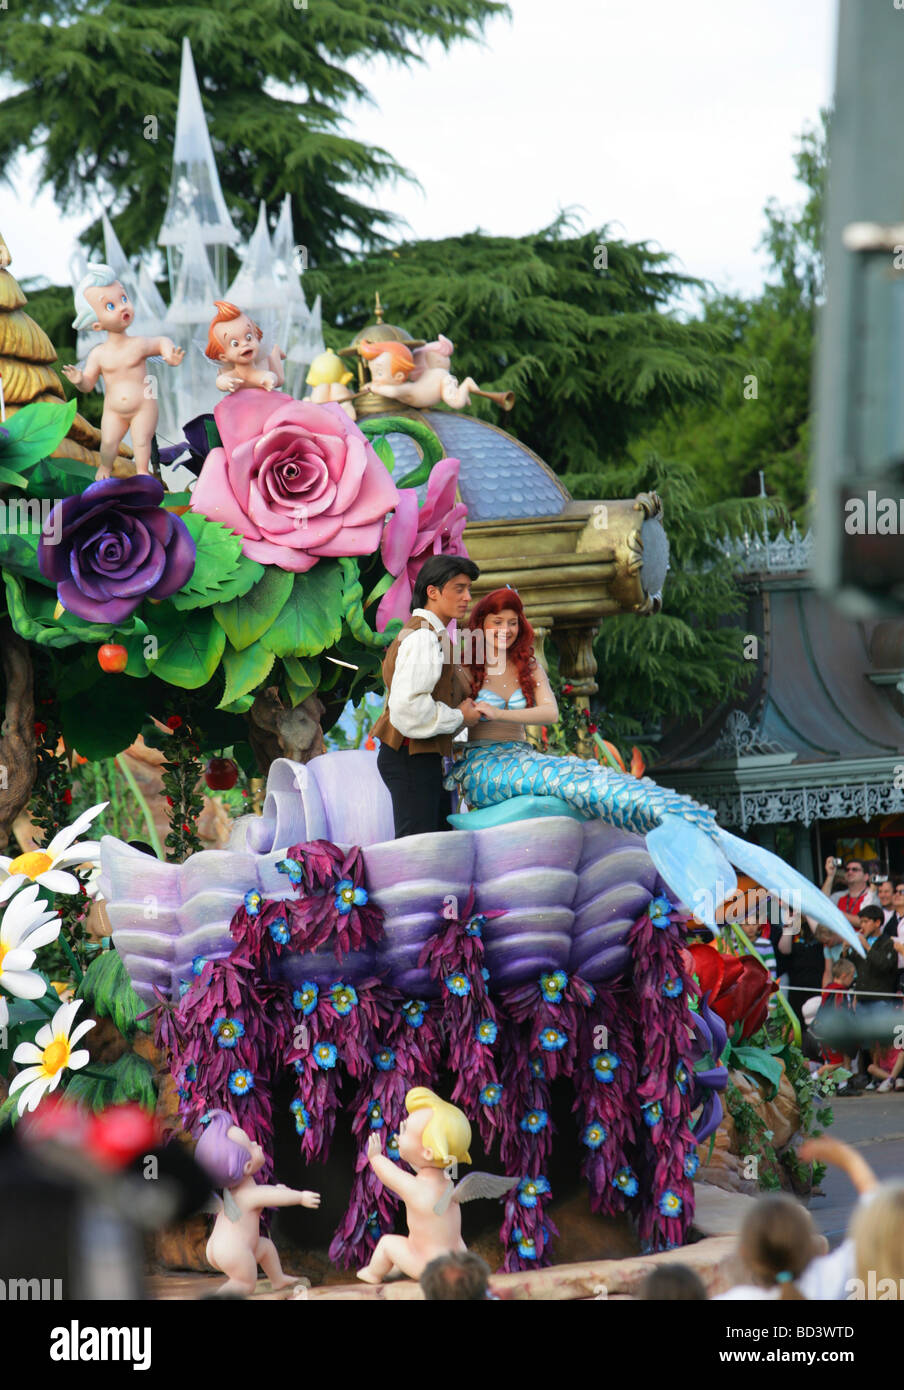 Parade Euro Disney Park Paris High Resolution Stock Photography And Images Alamy